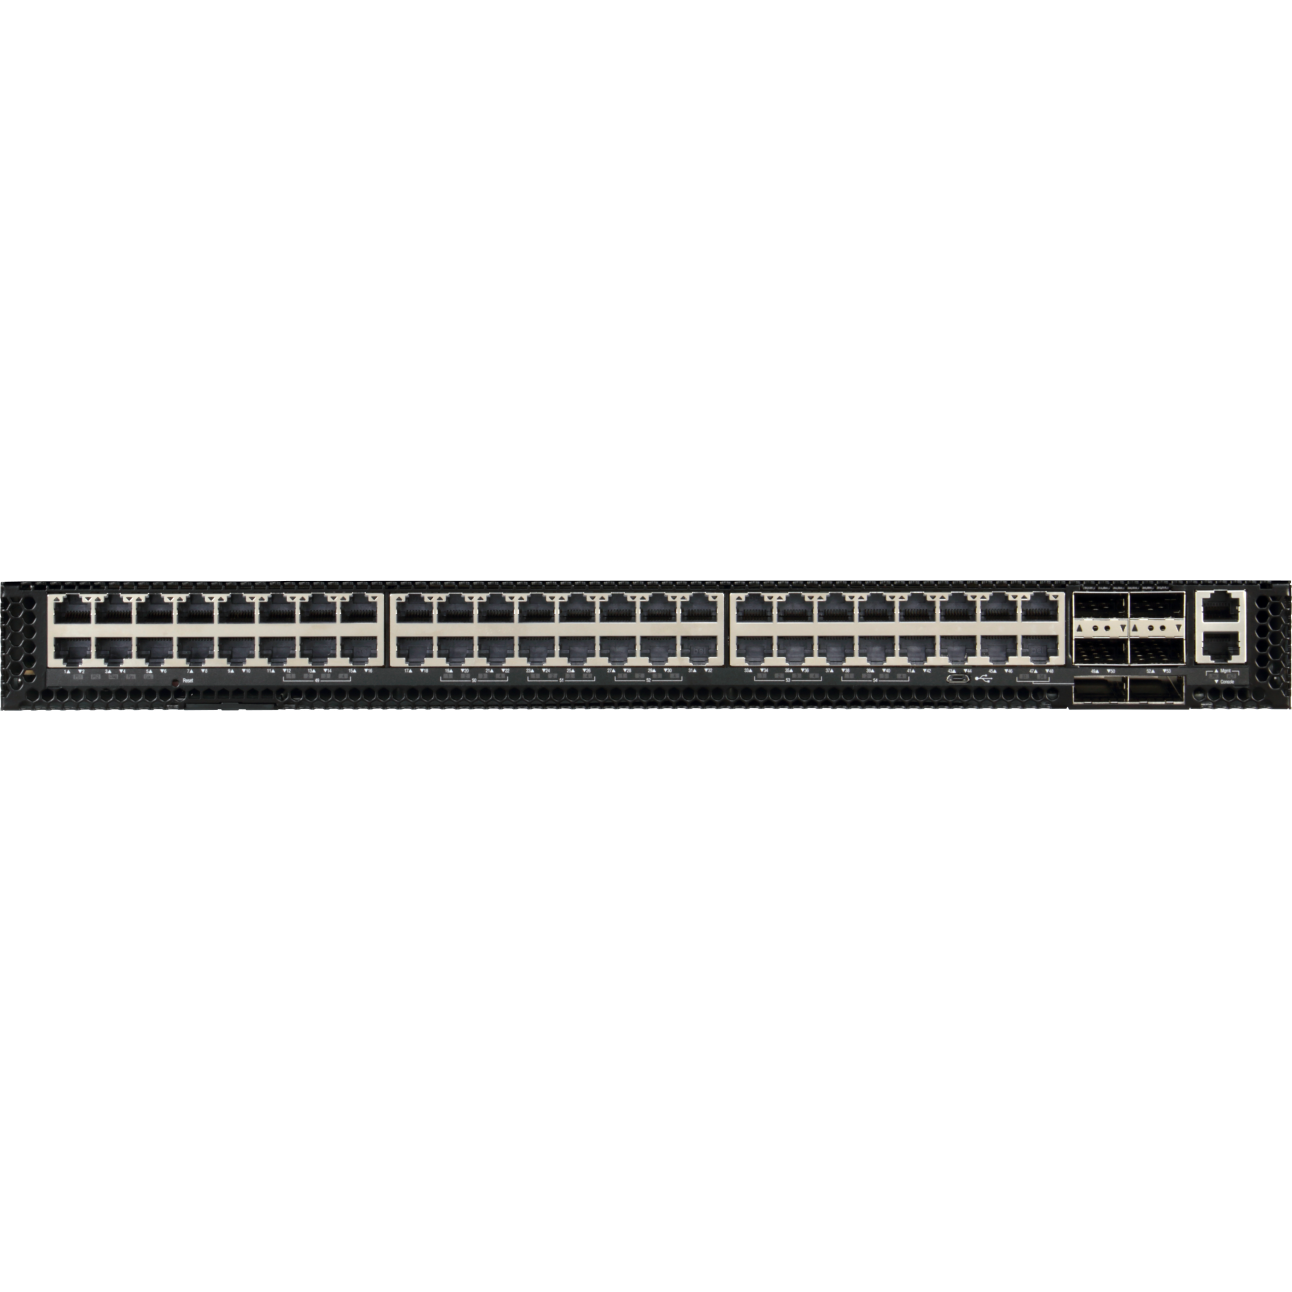 Bare-metal коммутатор Edgecore AS5812-54T, 220VAC, AFO